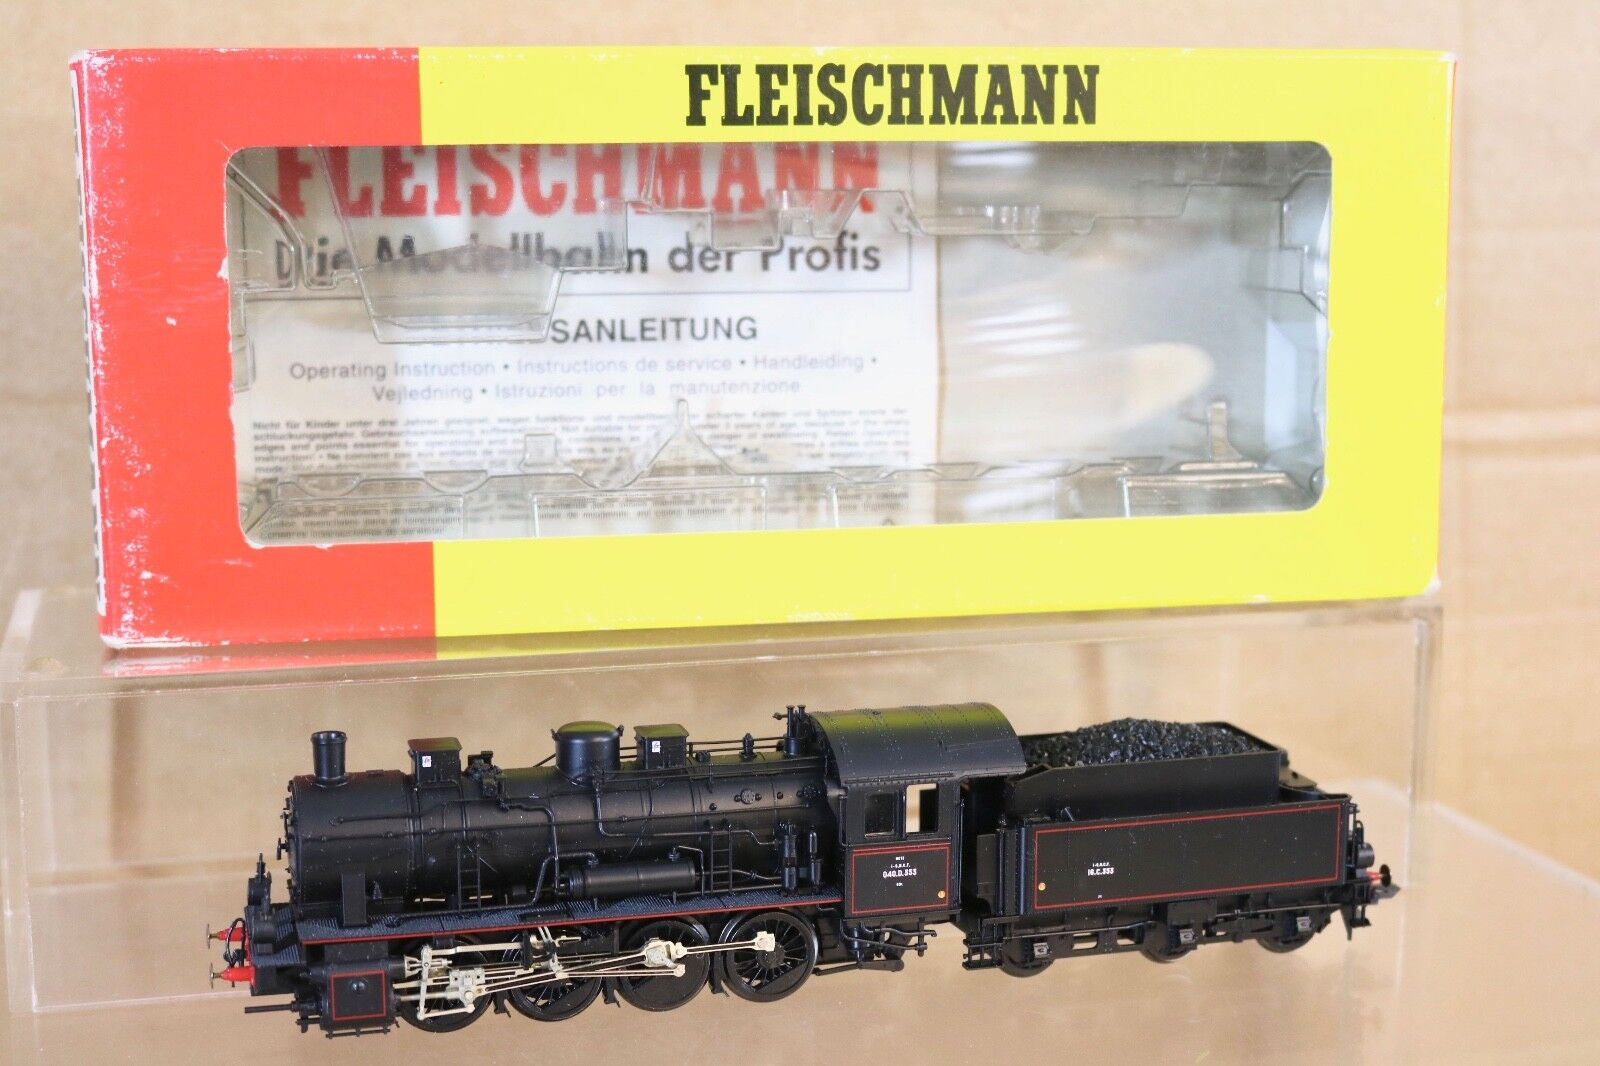 Fleischmann 4155 Fe SNCF 0 8 0 Clase Br 040 Diámetro 353 Locomotoras Metz en